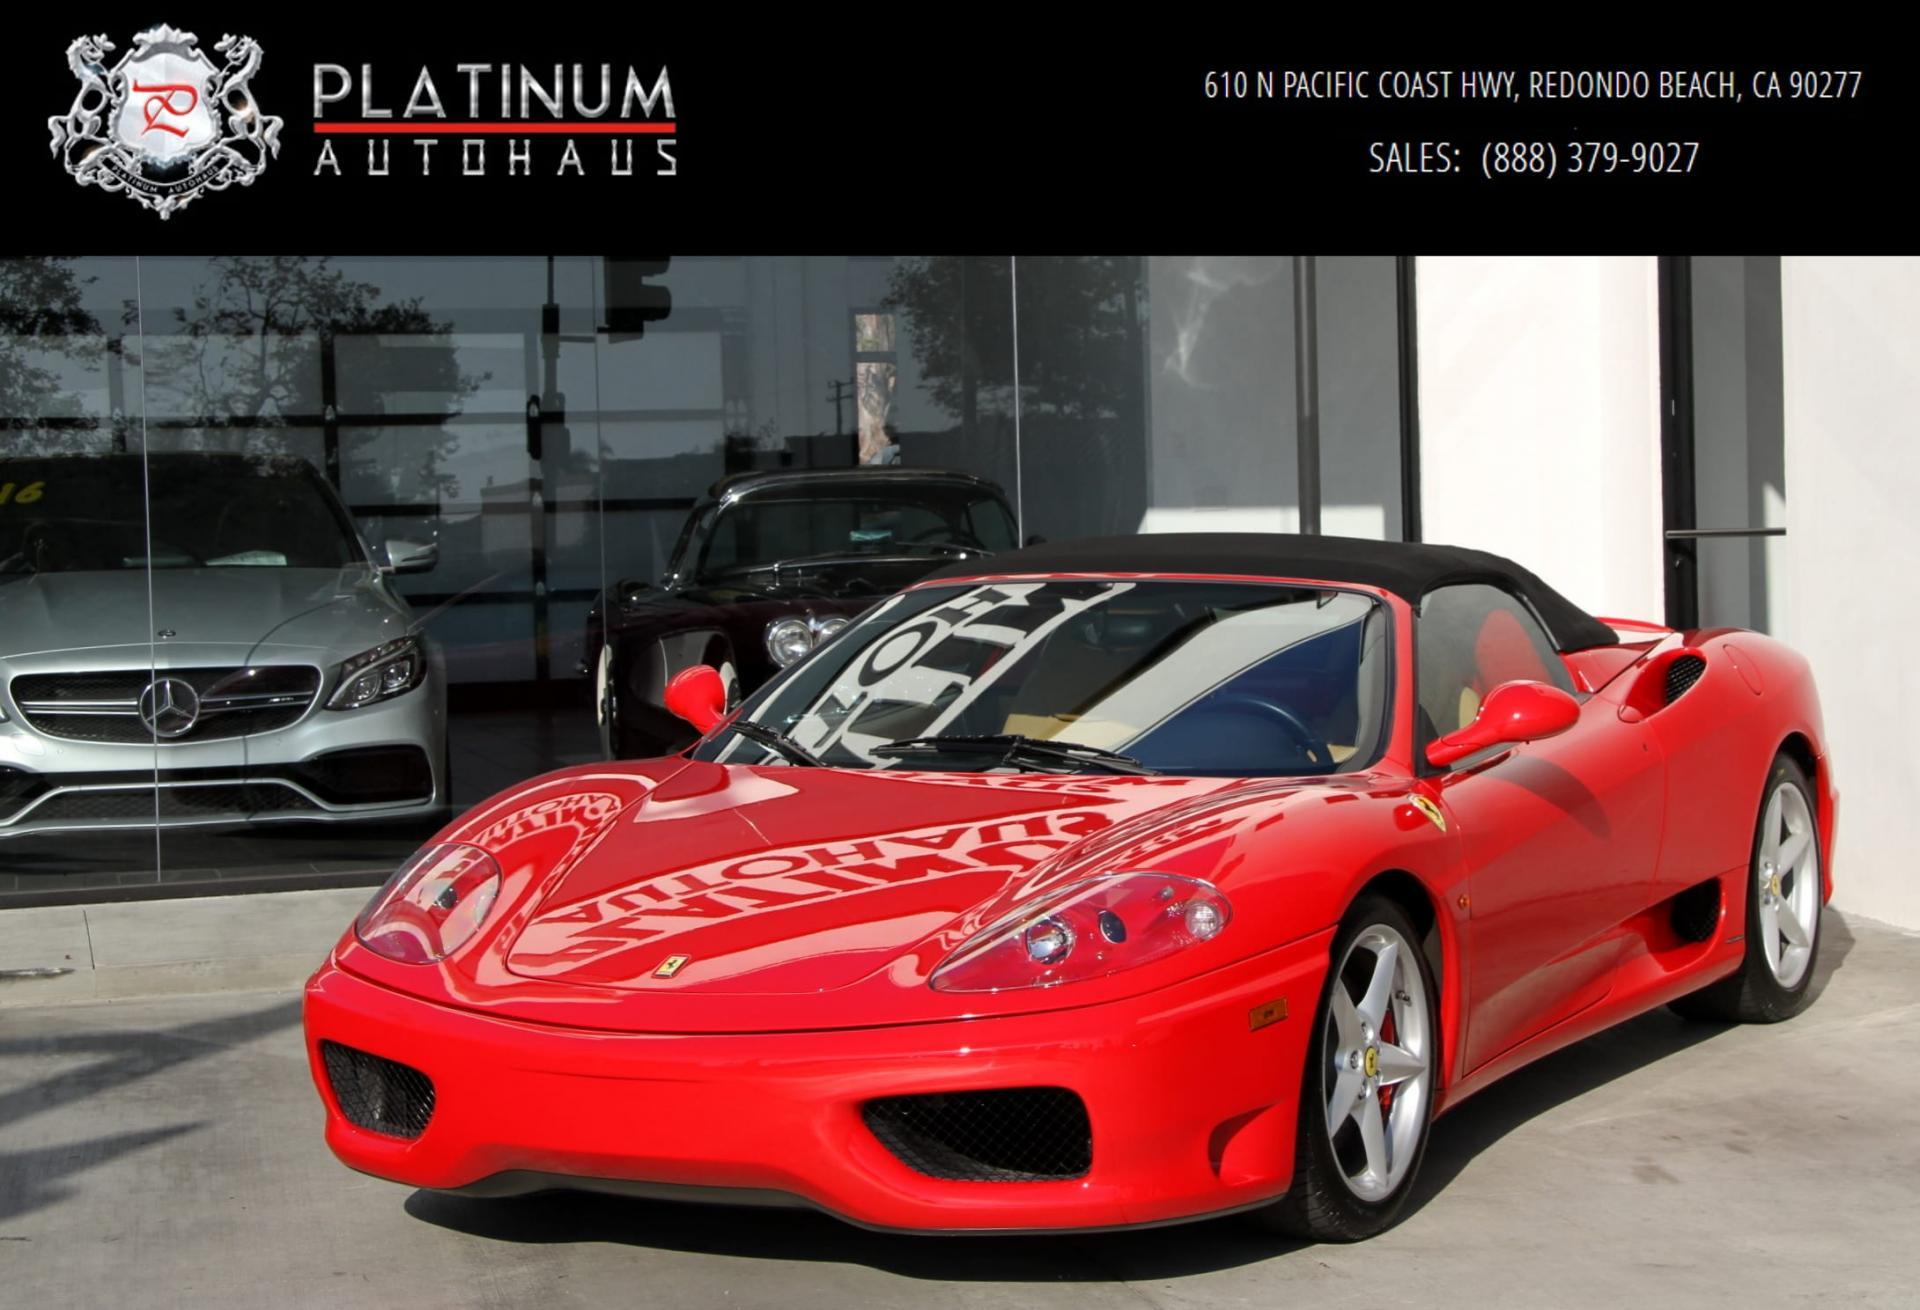 2003 Ferrari 360 Modena Spider F1 Only 6k Miles Stock 6021 For Sale Near Redondo Beach Ca Ca Ferrari Dealer